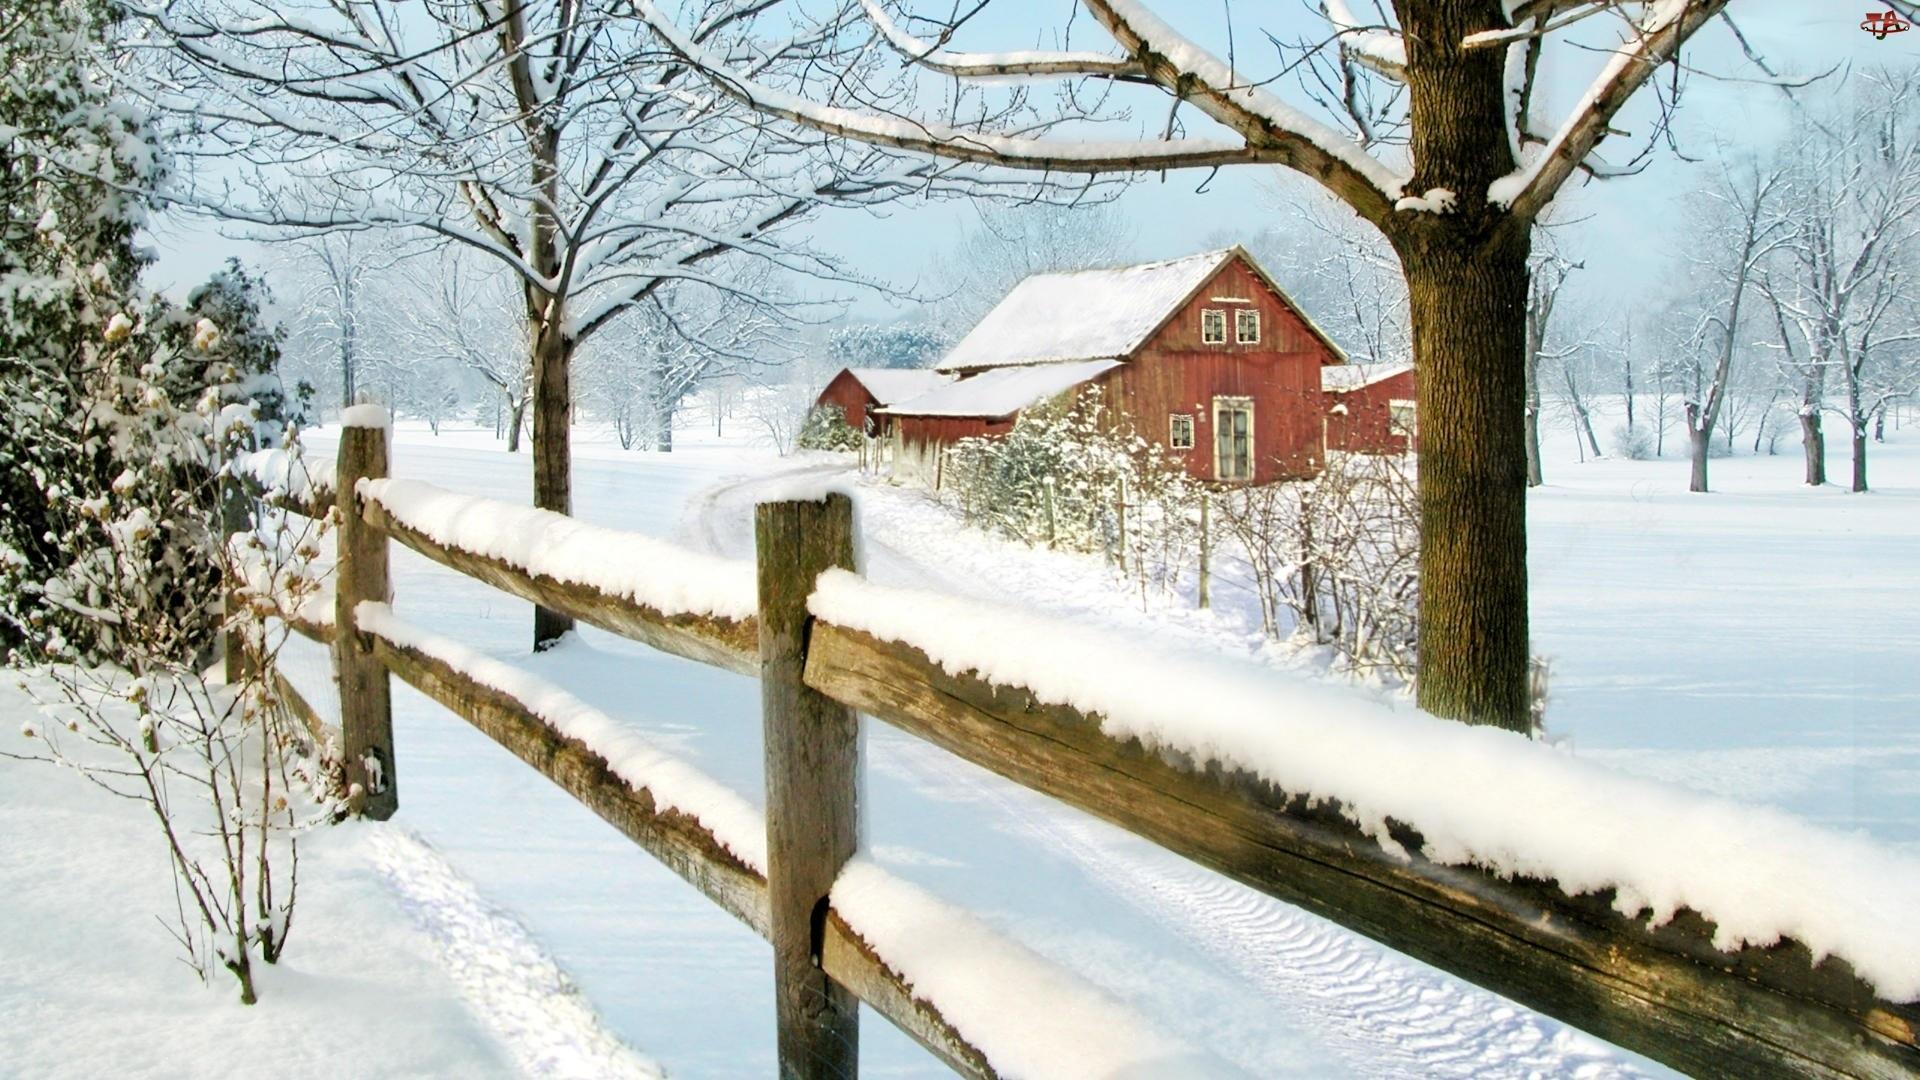 Śnieg, Dom, Zima, Drzewa, Płot, Droga